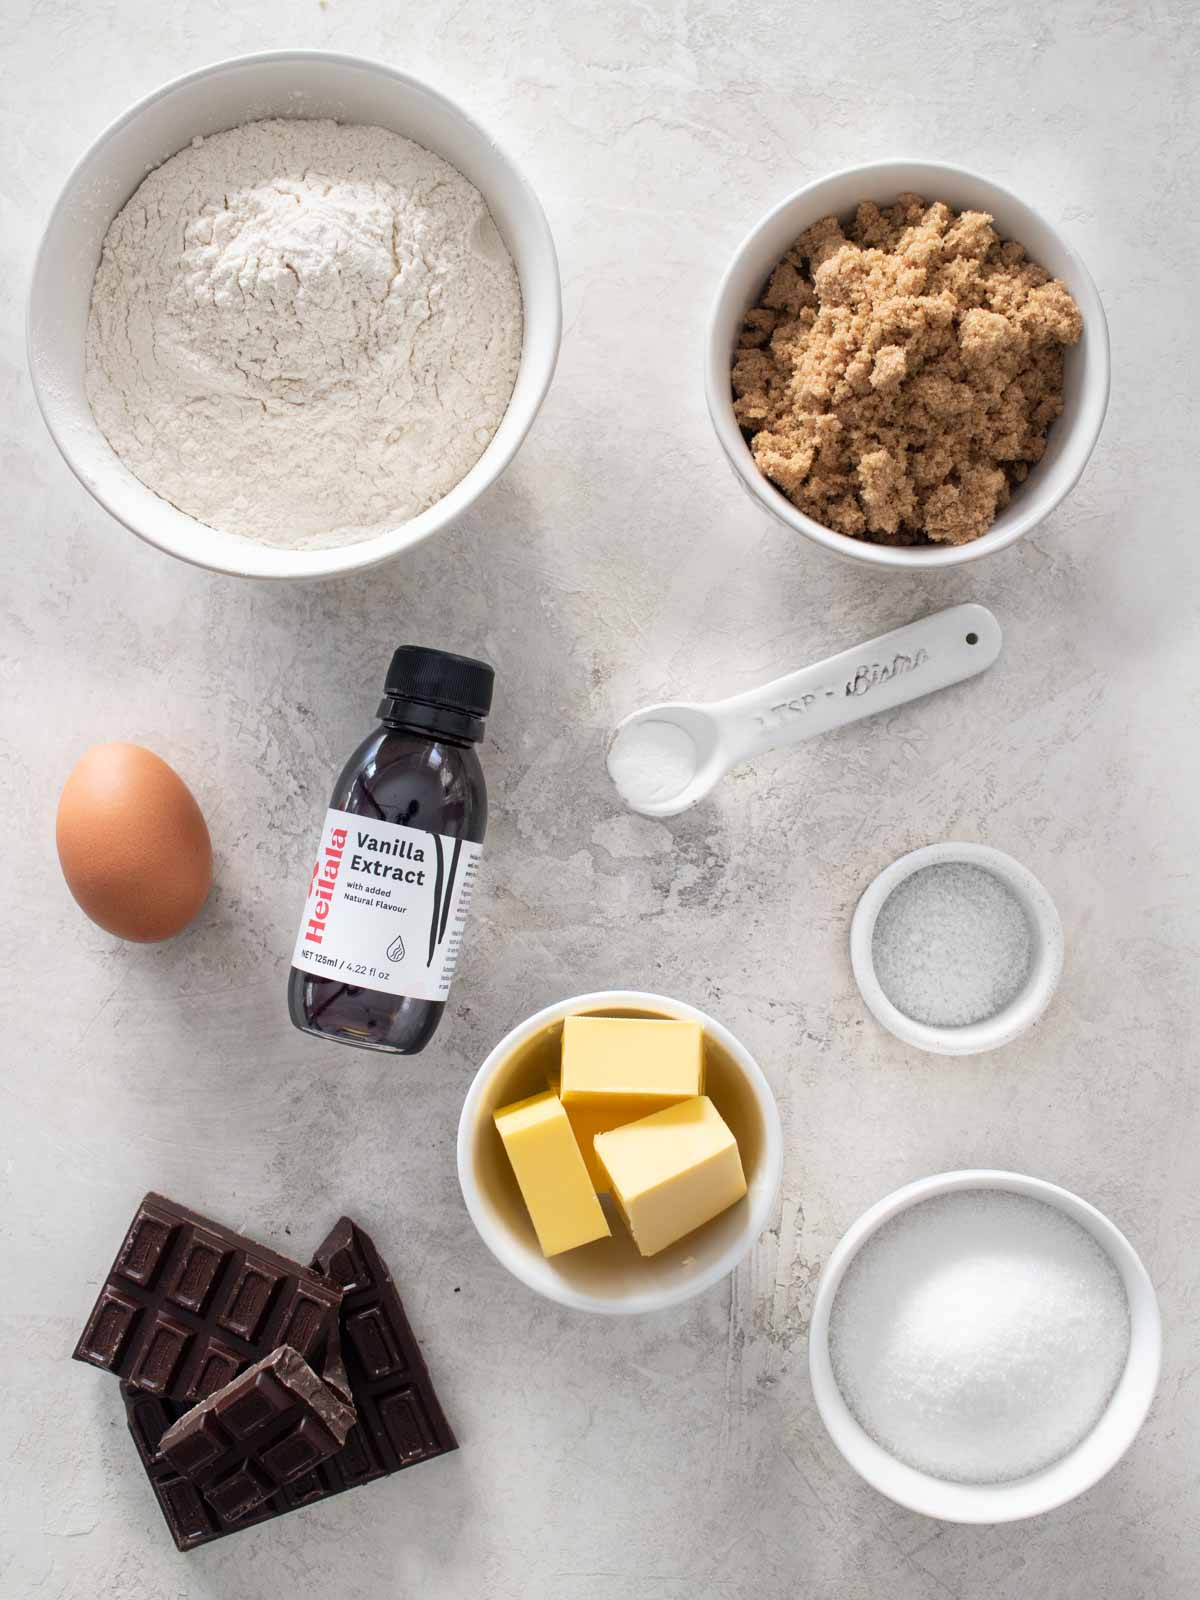 Chocolate Chip Cookies Recipe Ingredients